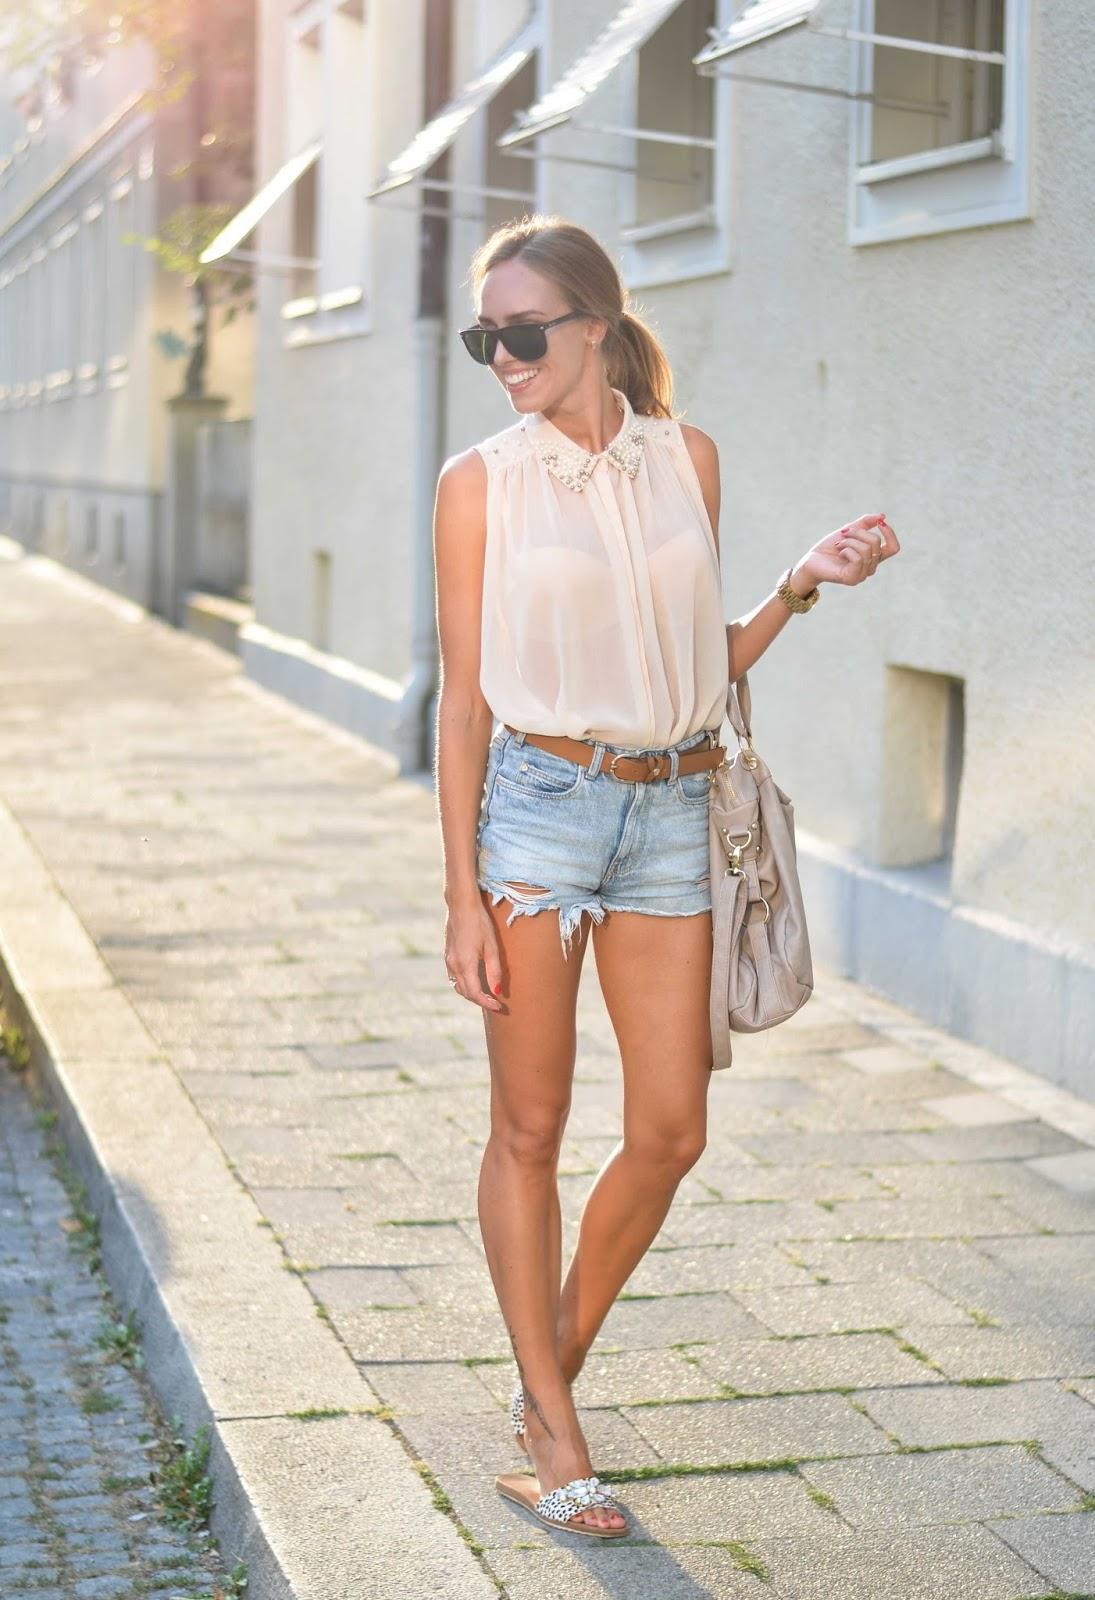 kristjaana mere munich fashion blogger summer outfit